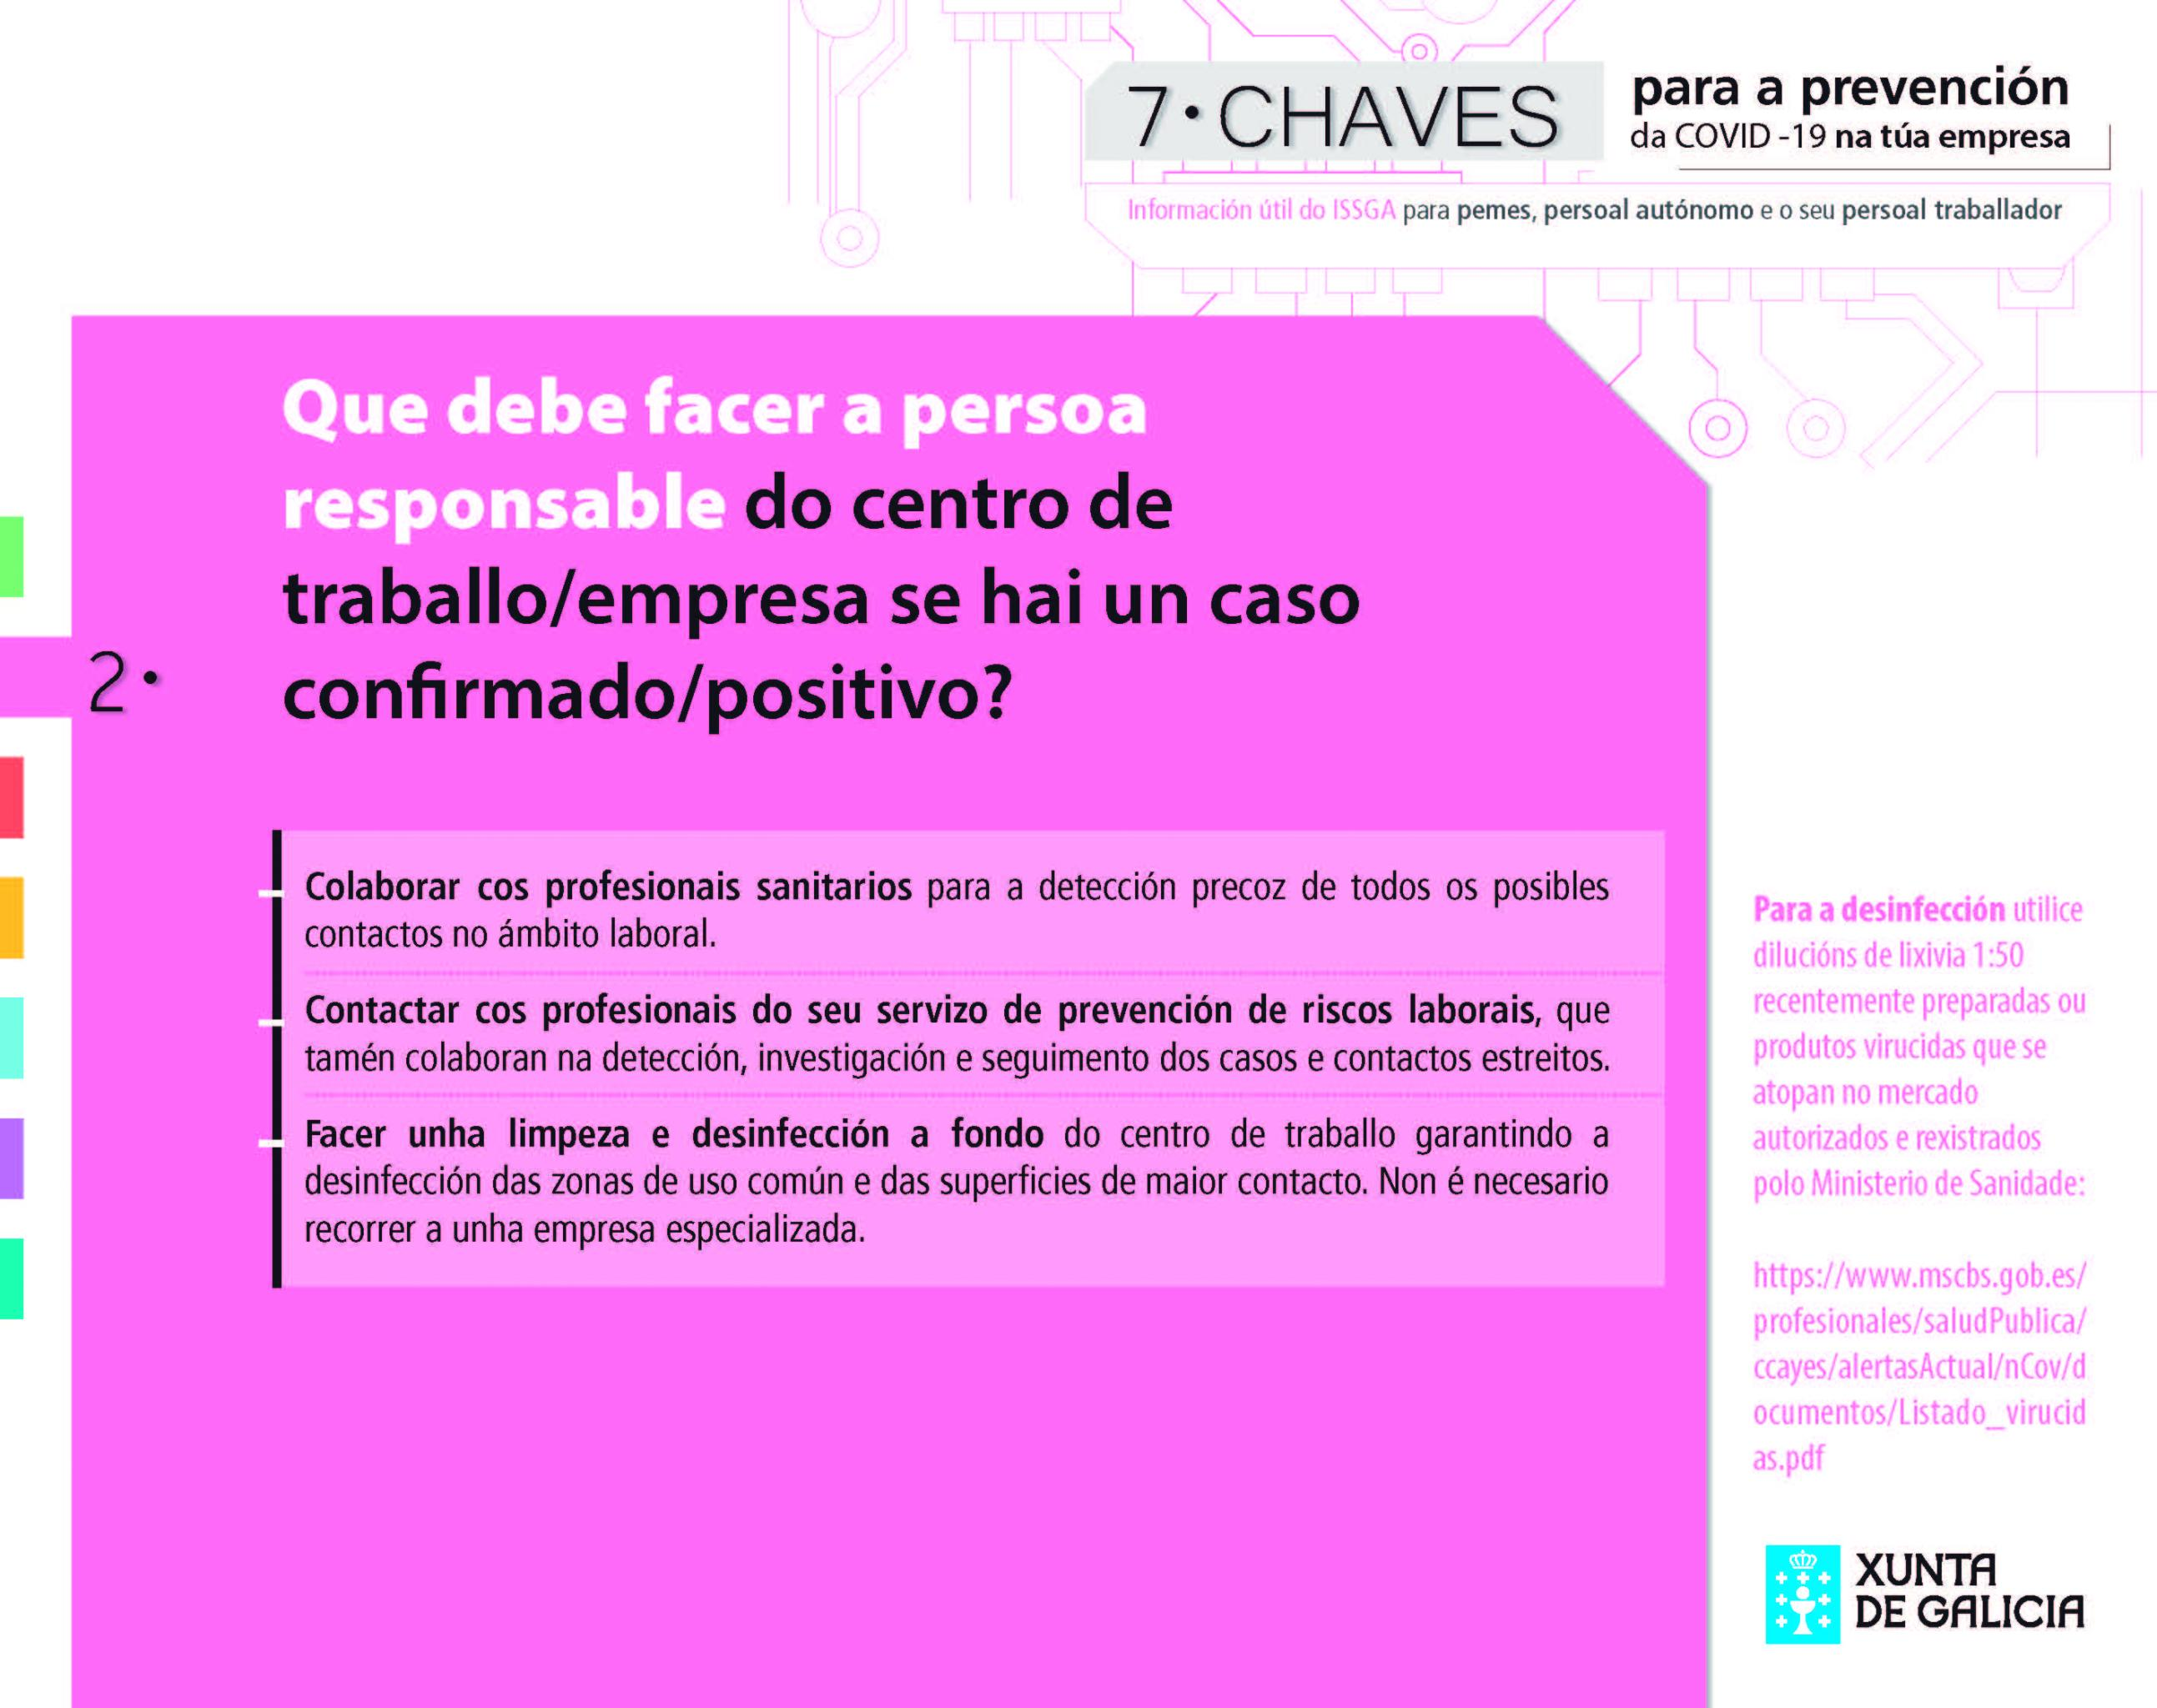 7_chaves_covid_Página_3.jpg